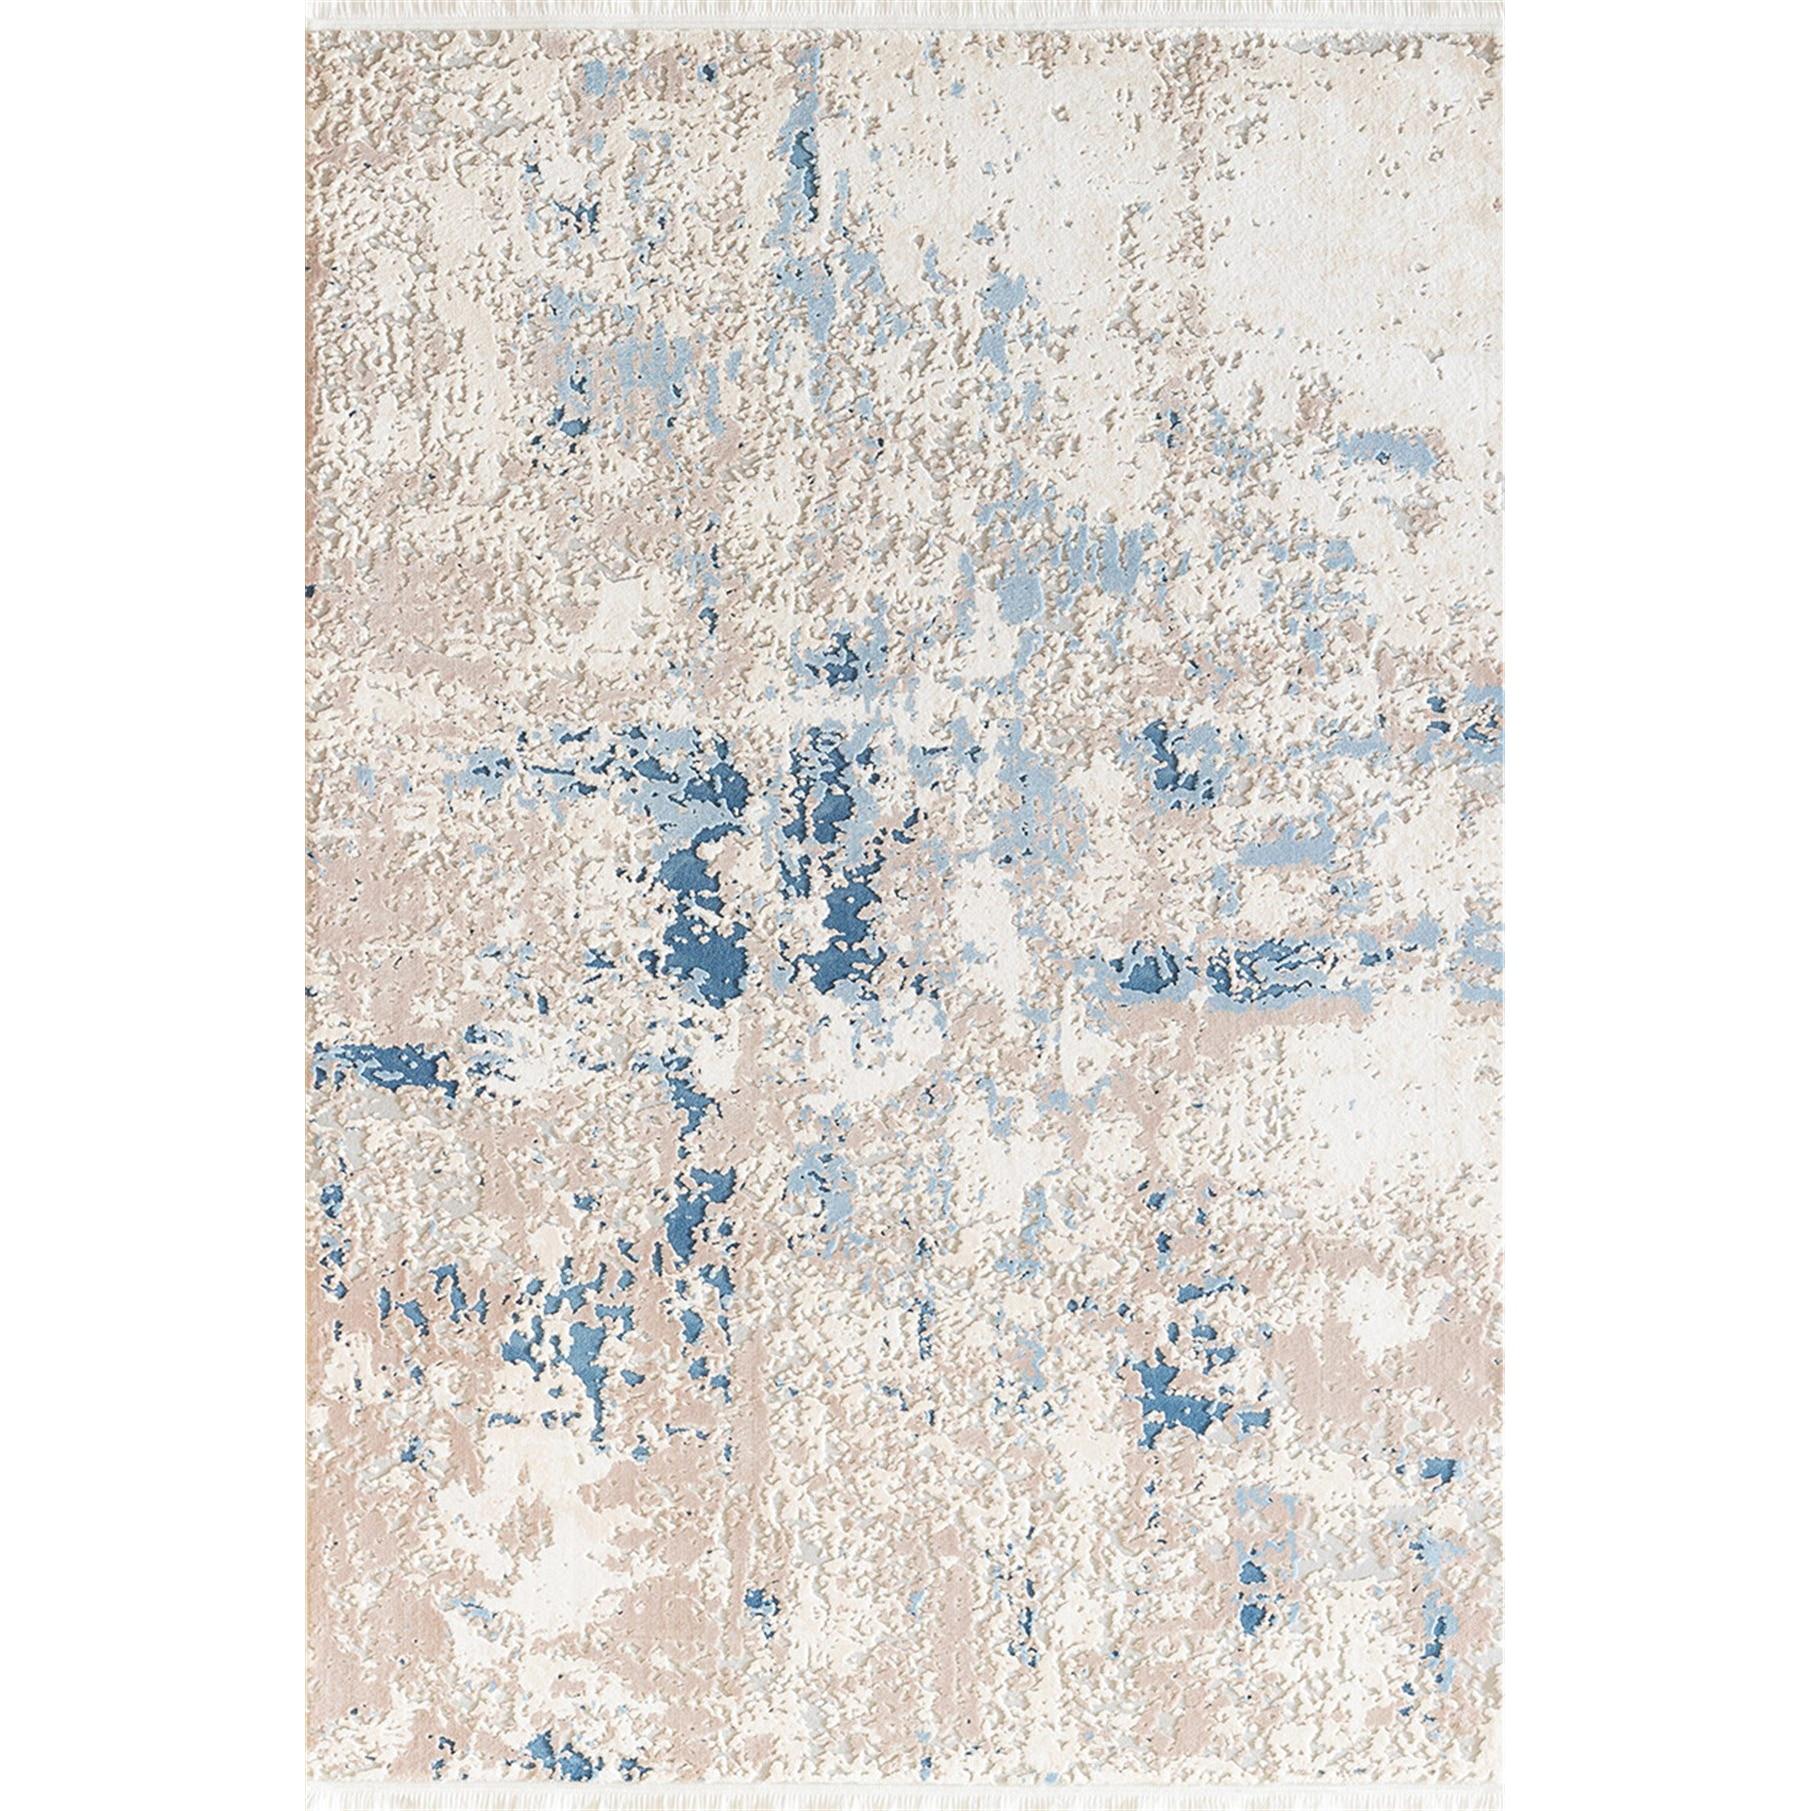 Fotografie Covor Girit Pierre Cardin, antistatic, acrilic, 80x150 cm, albastru/crem, GR12B